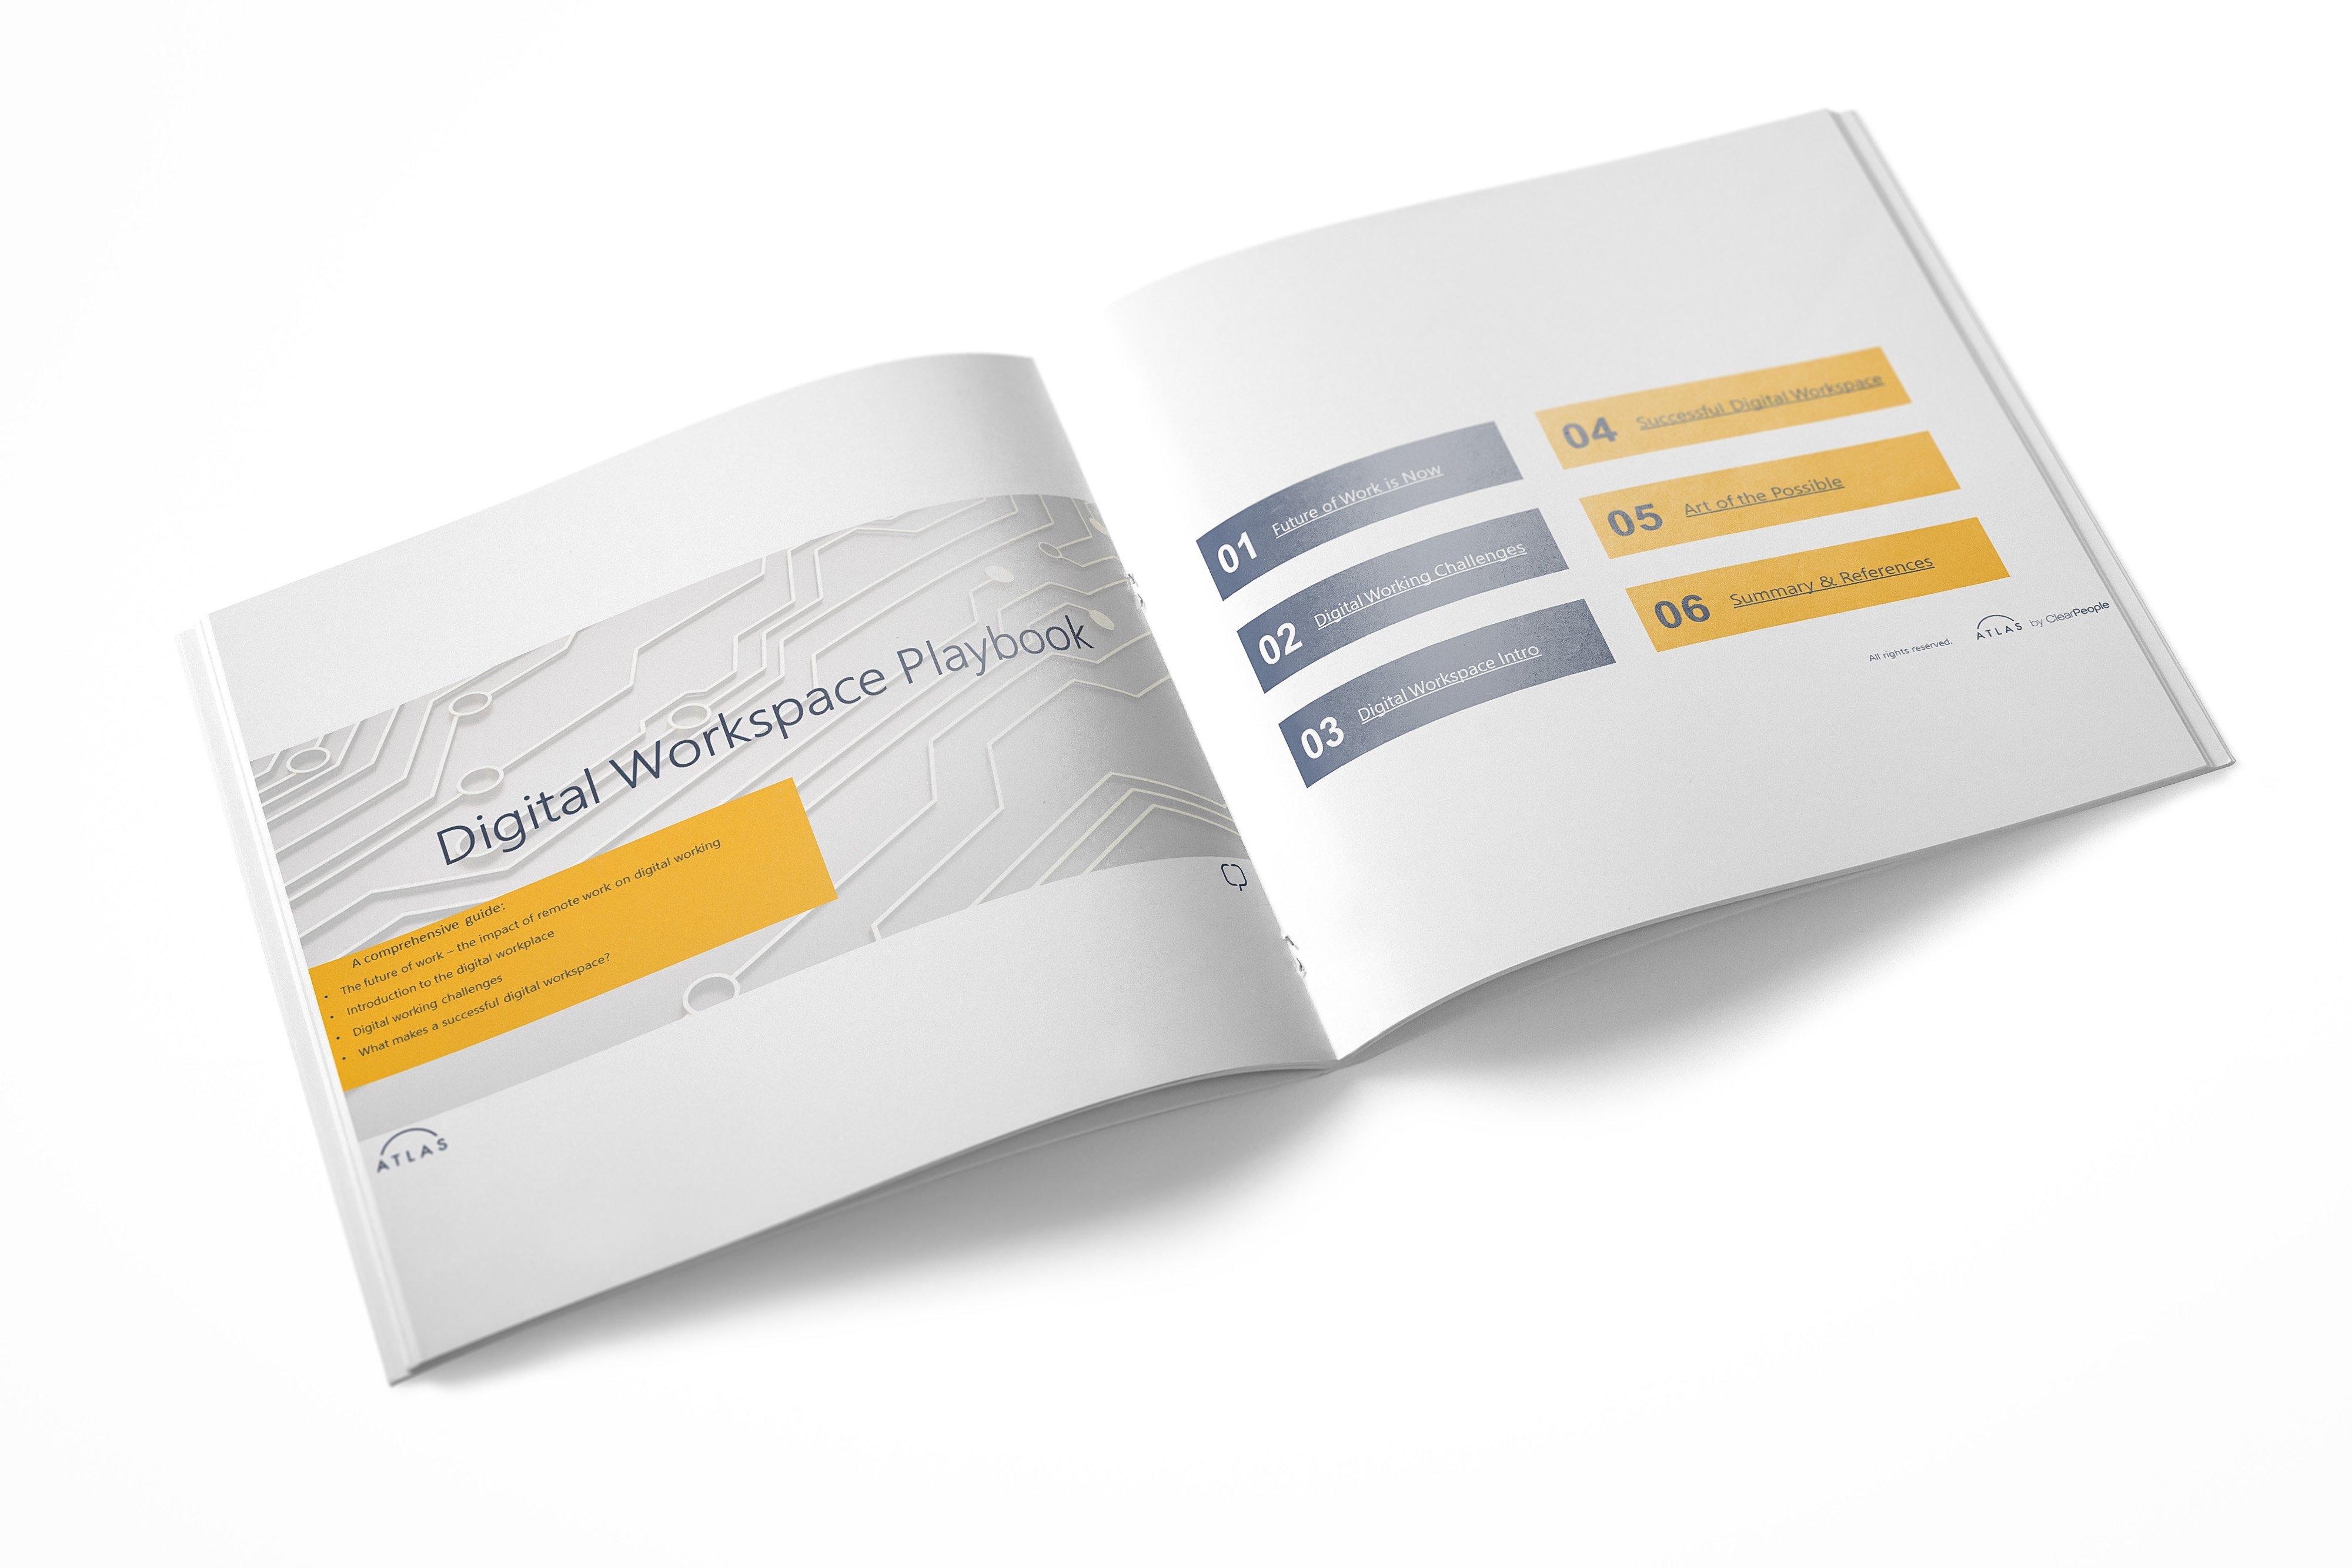 Digital Workspace Playbook Illustration